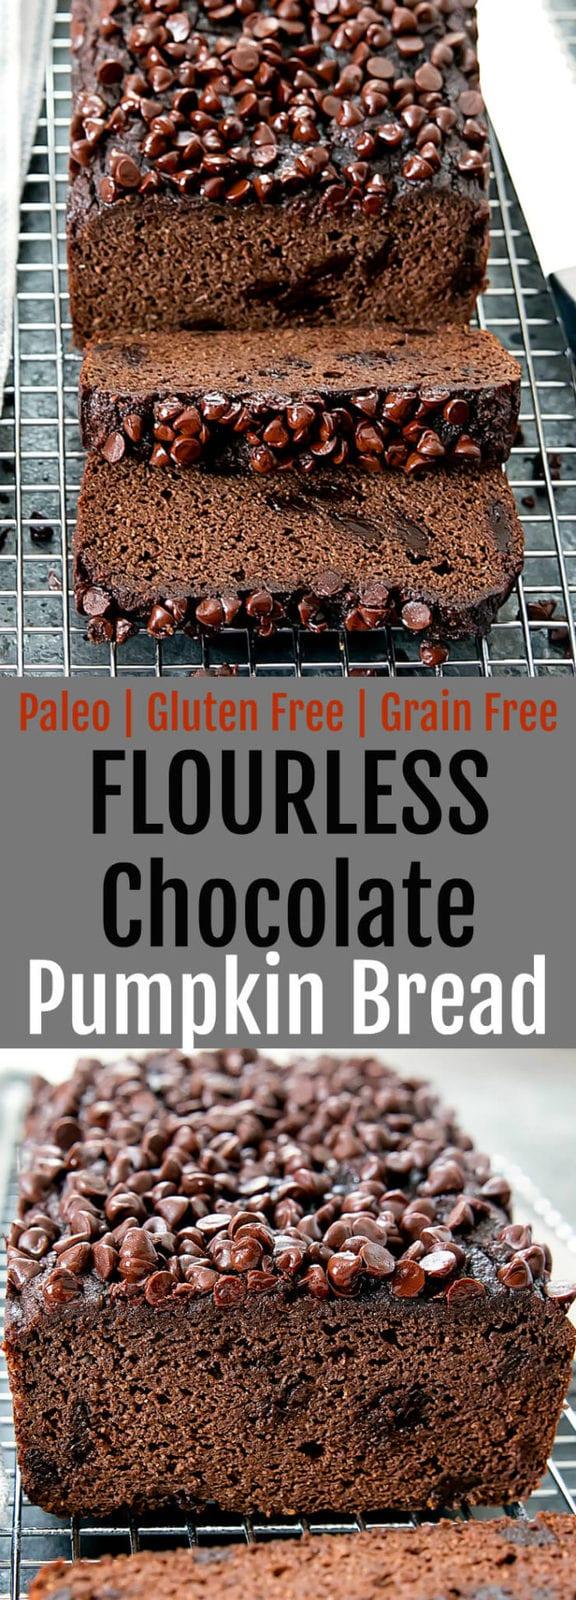 Flourless Paleo Chocolate Pumpkin Bread